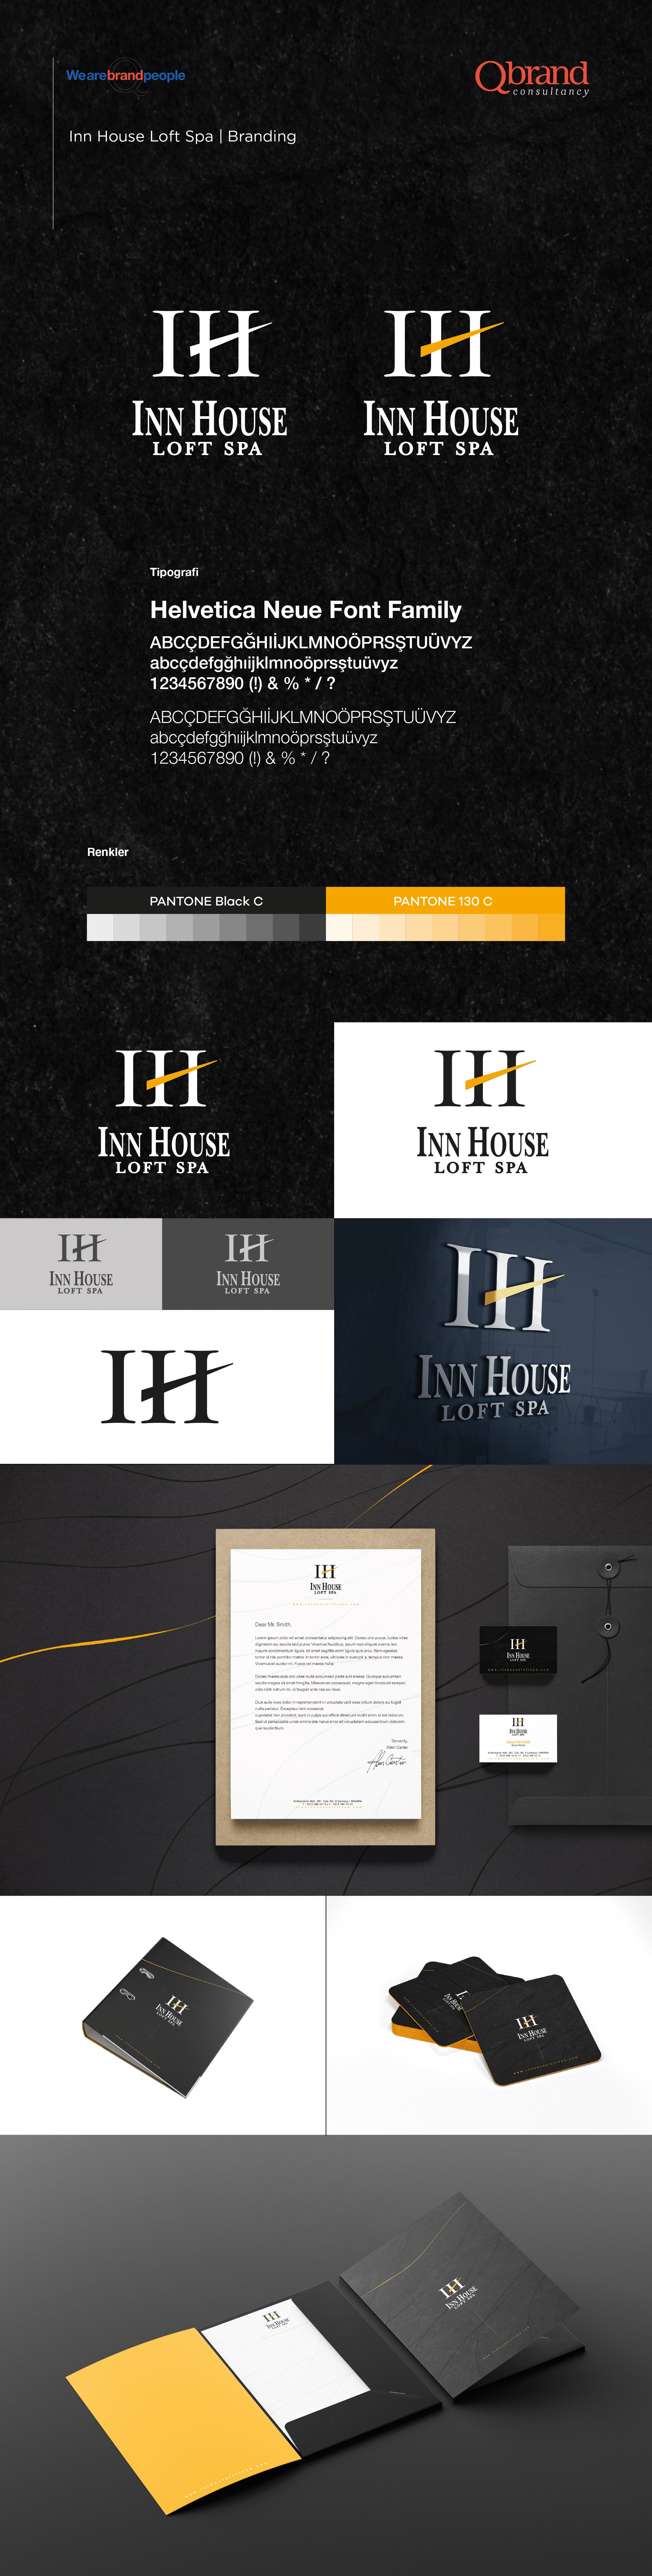 Ankara kurumsal kimlik tasarımı  İnn House Loft Spa